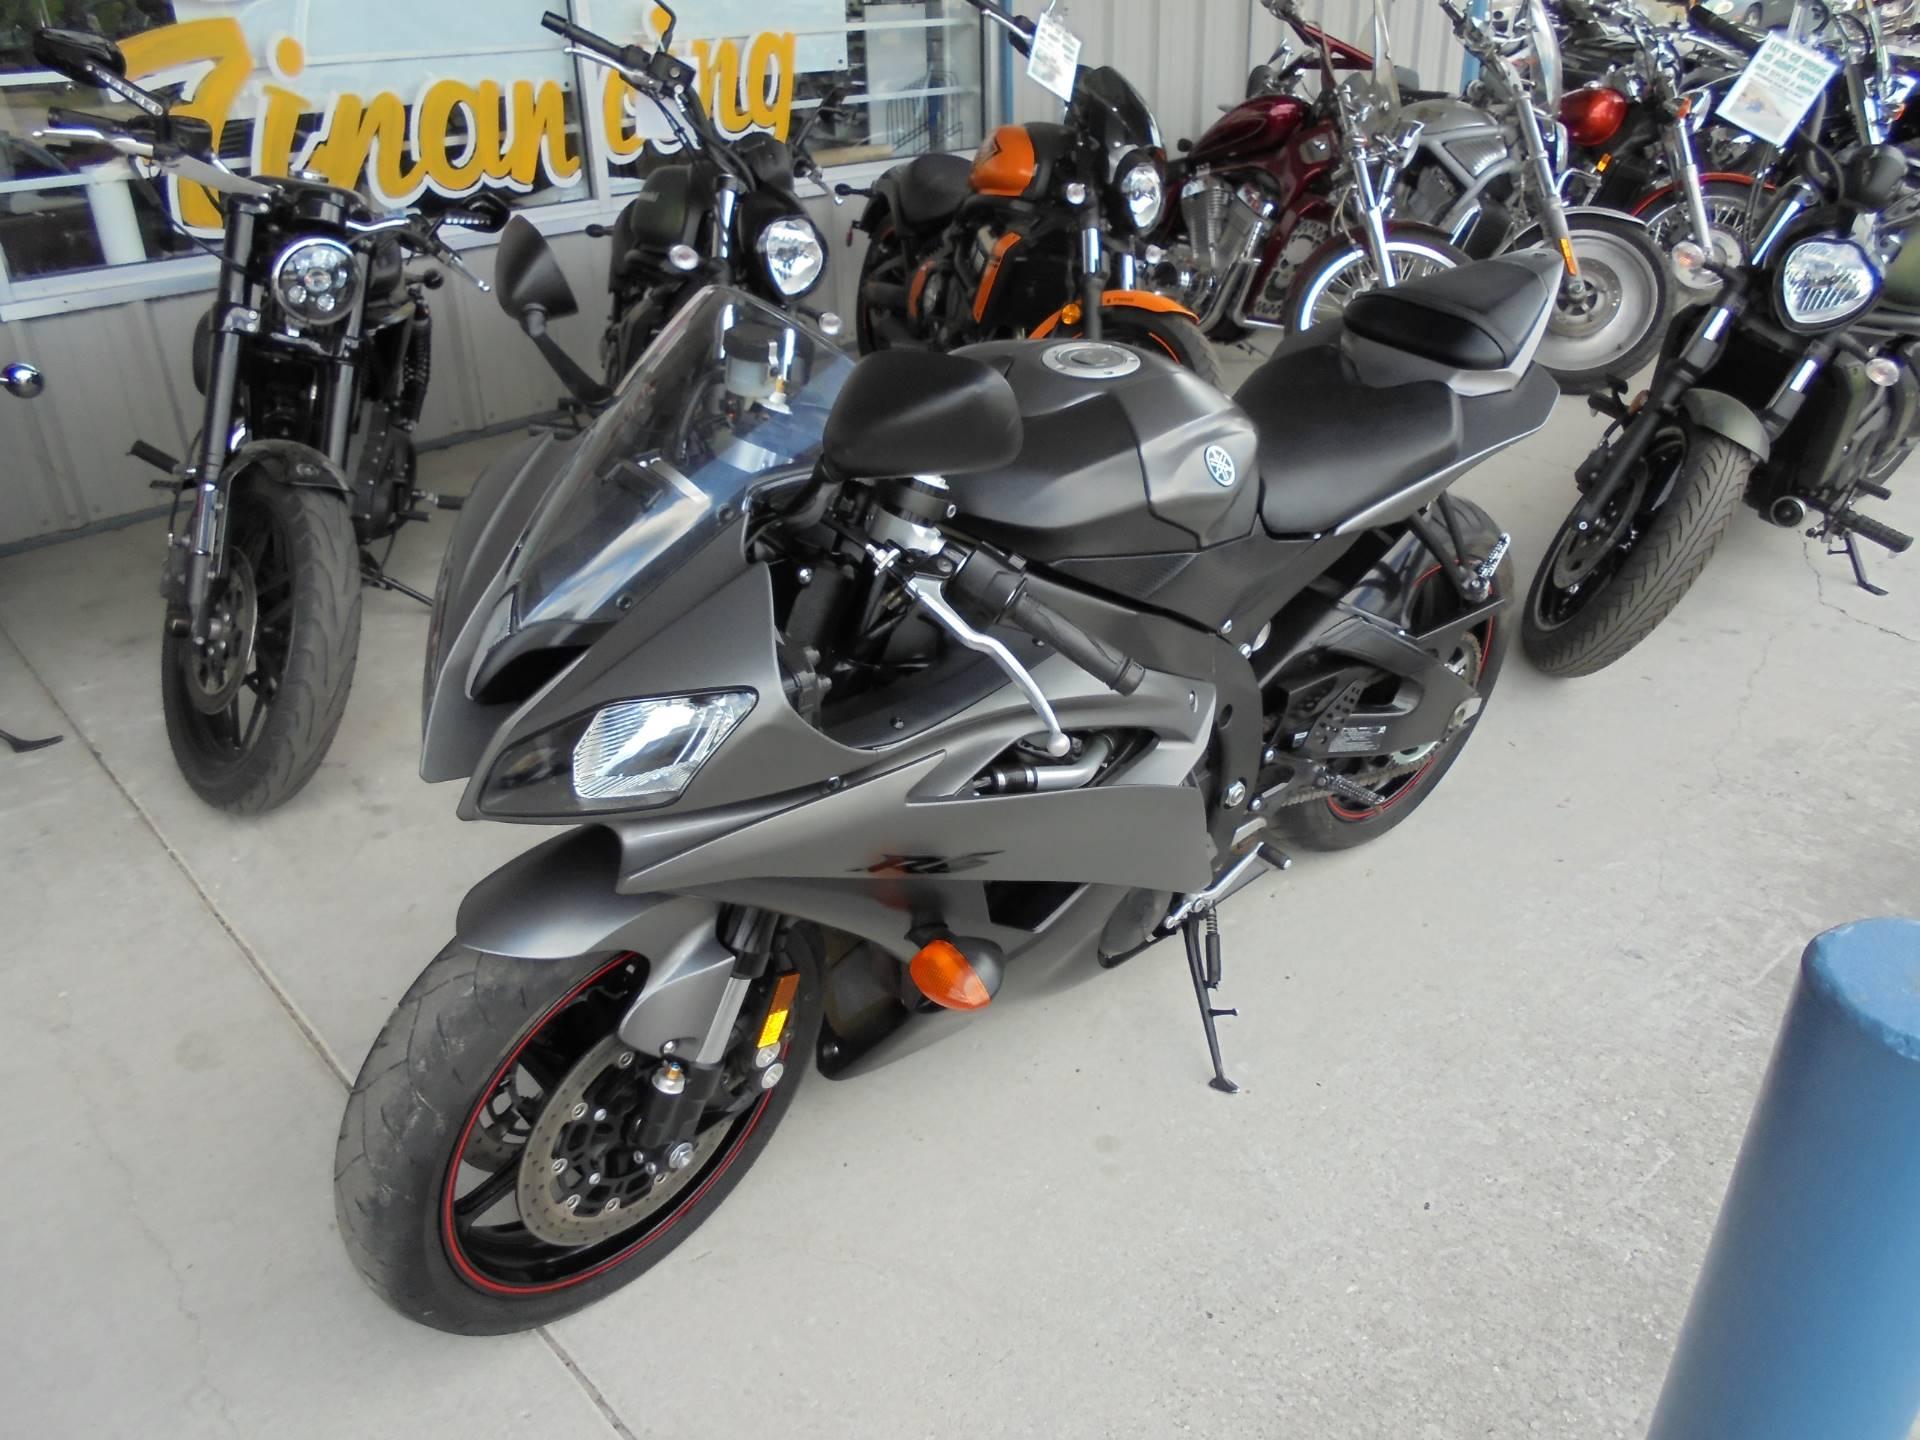 2013 Yamaha YZF-R6 2